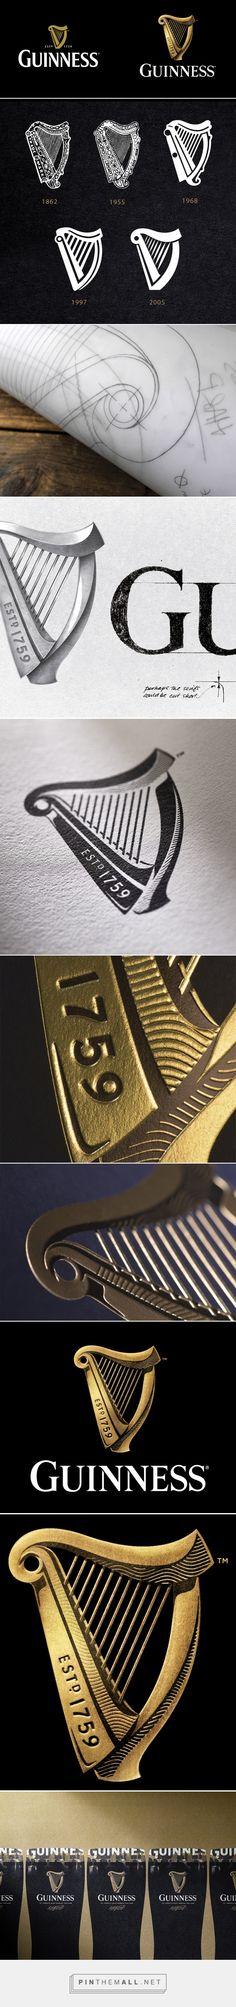 Brand New: New Logo for Guinness by Design Bridge - created via https://pinthemall.net